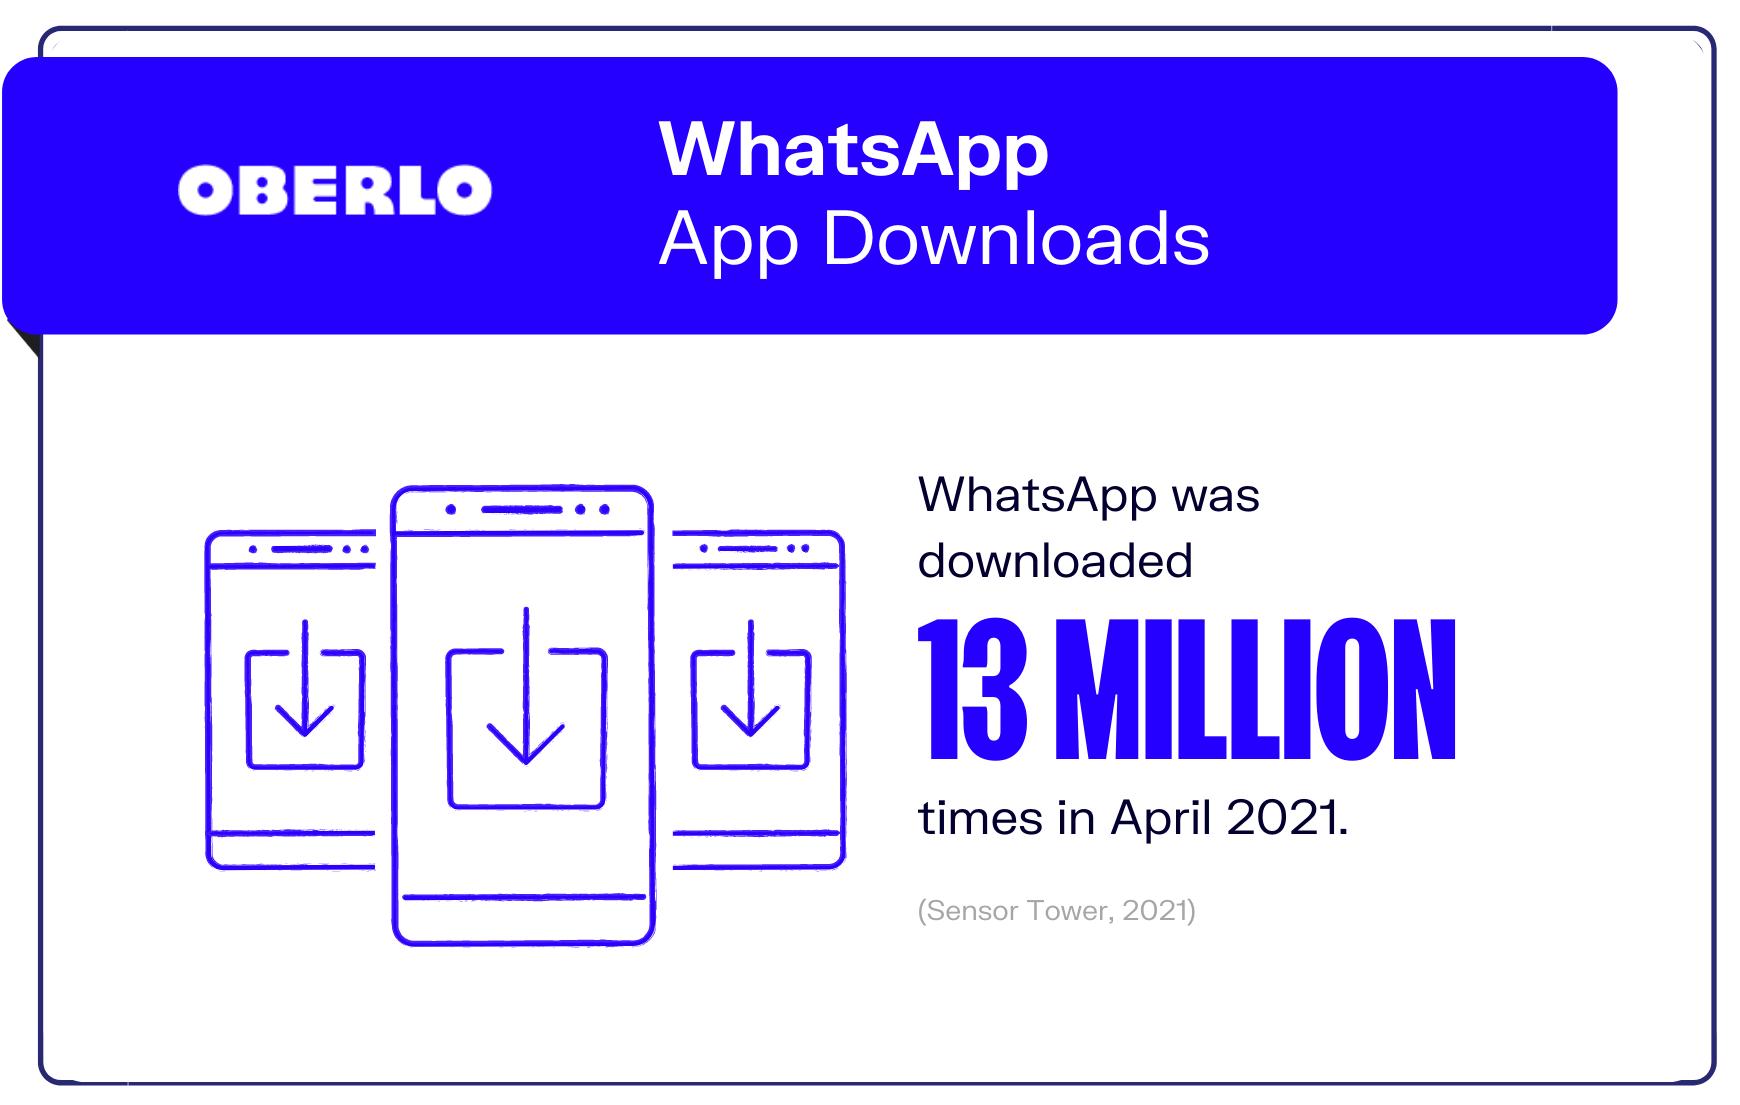 graphic of whatsapp statistic #3